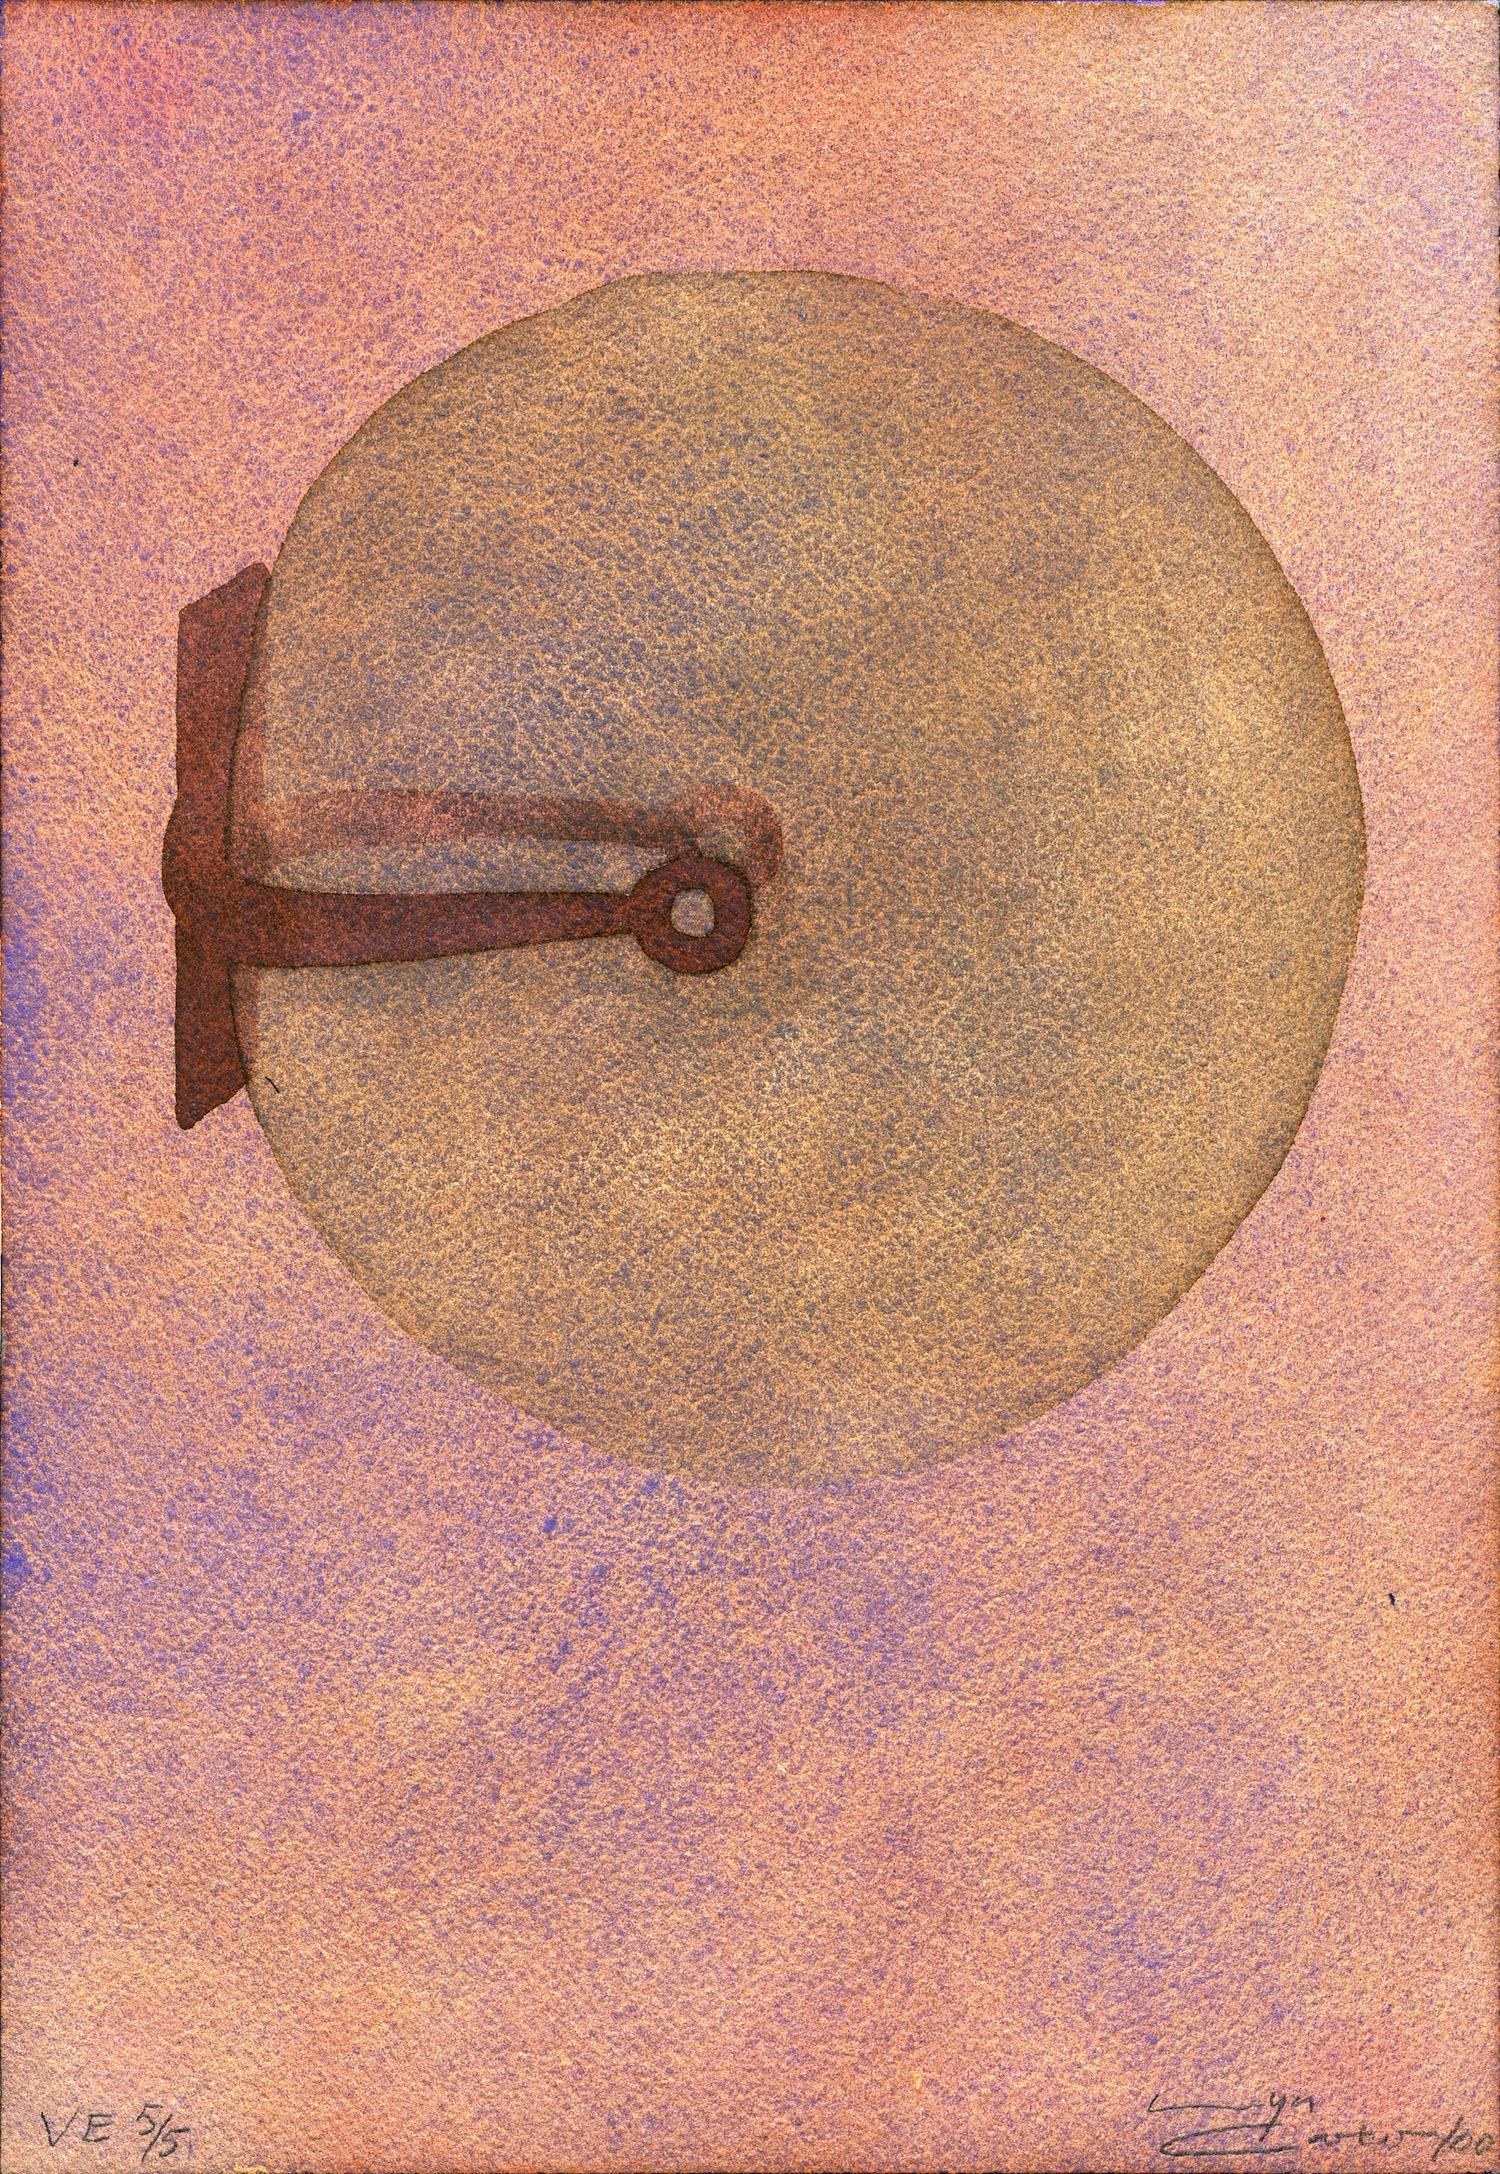 LYN CARTER    Swallowing Air: Study , 2000 Watercolour